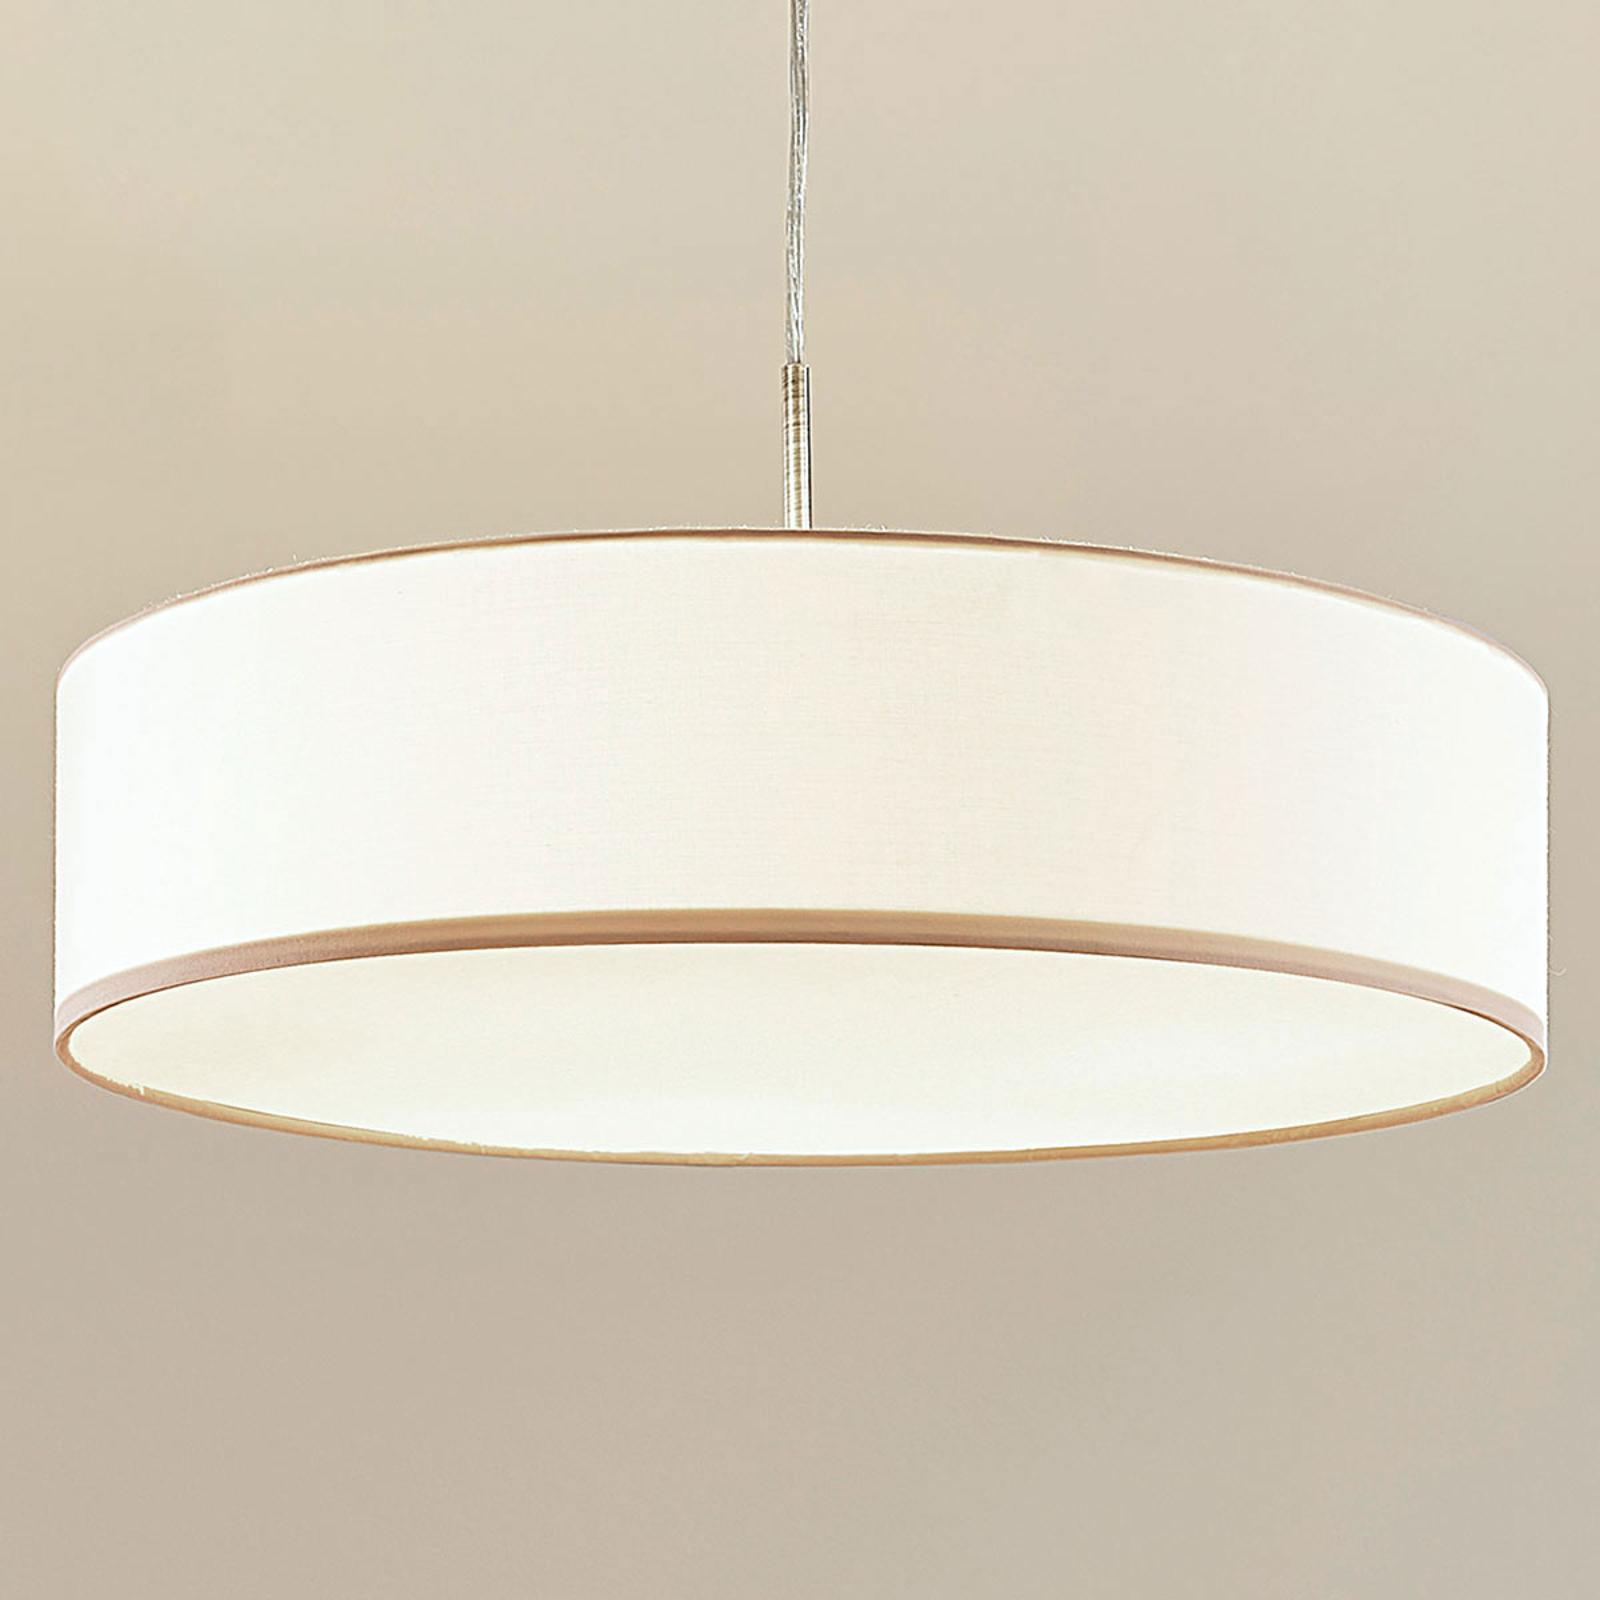 Kremowa lampa wisząca LED SEBATIN z materiału